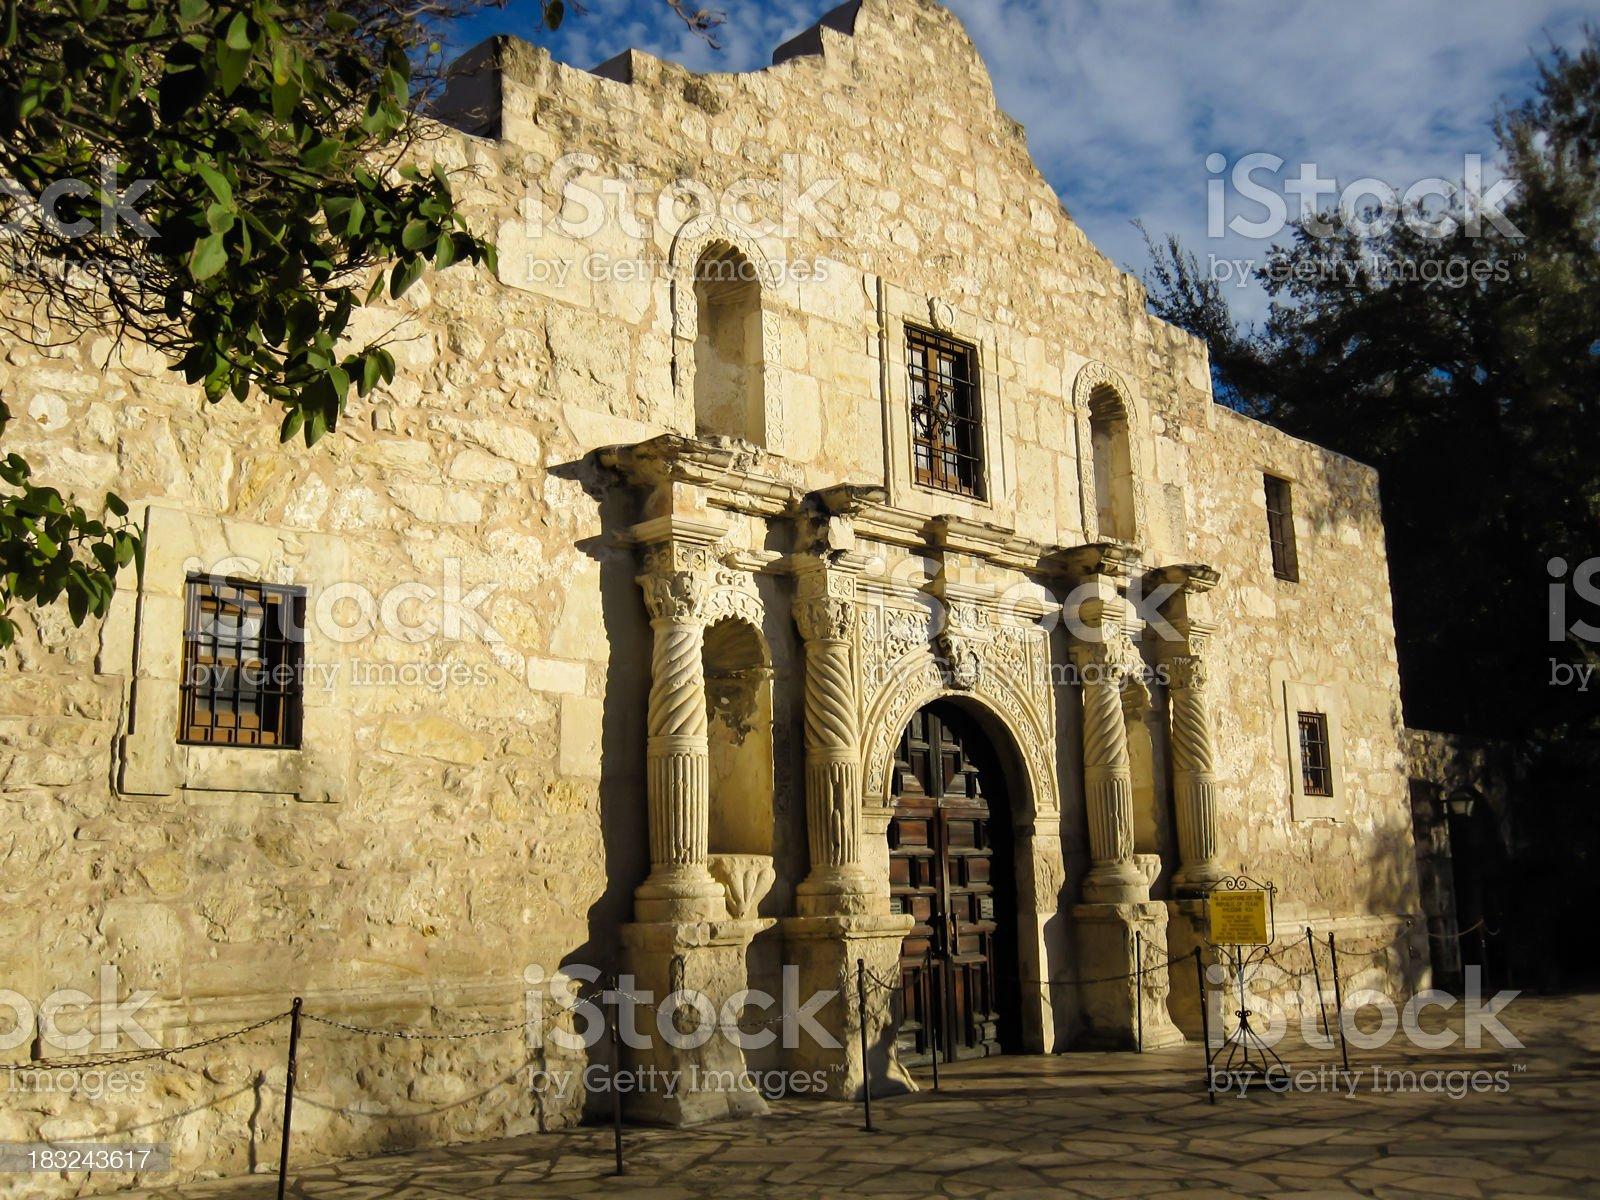 Alamo Mission historic building royalty-free stock photo